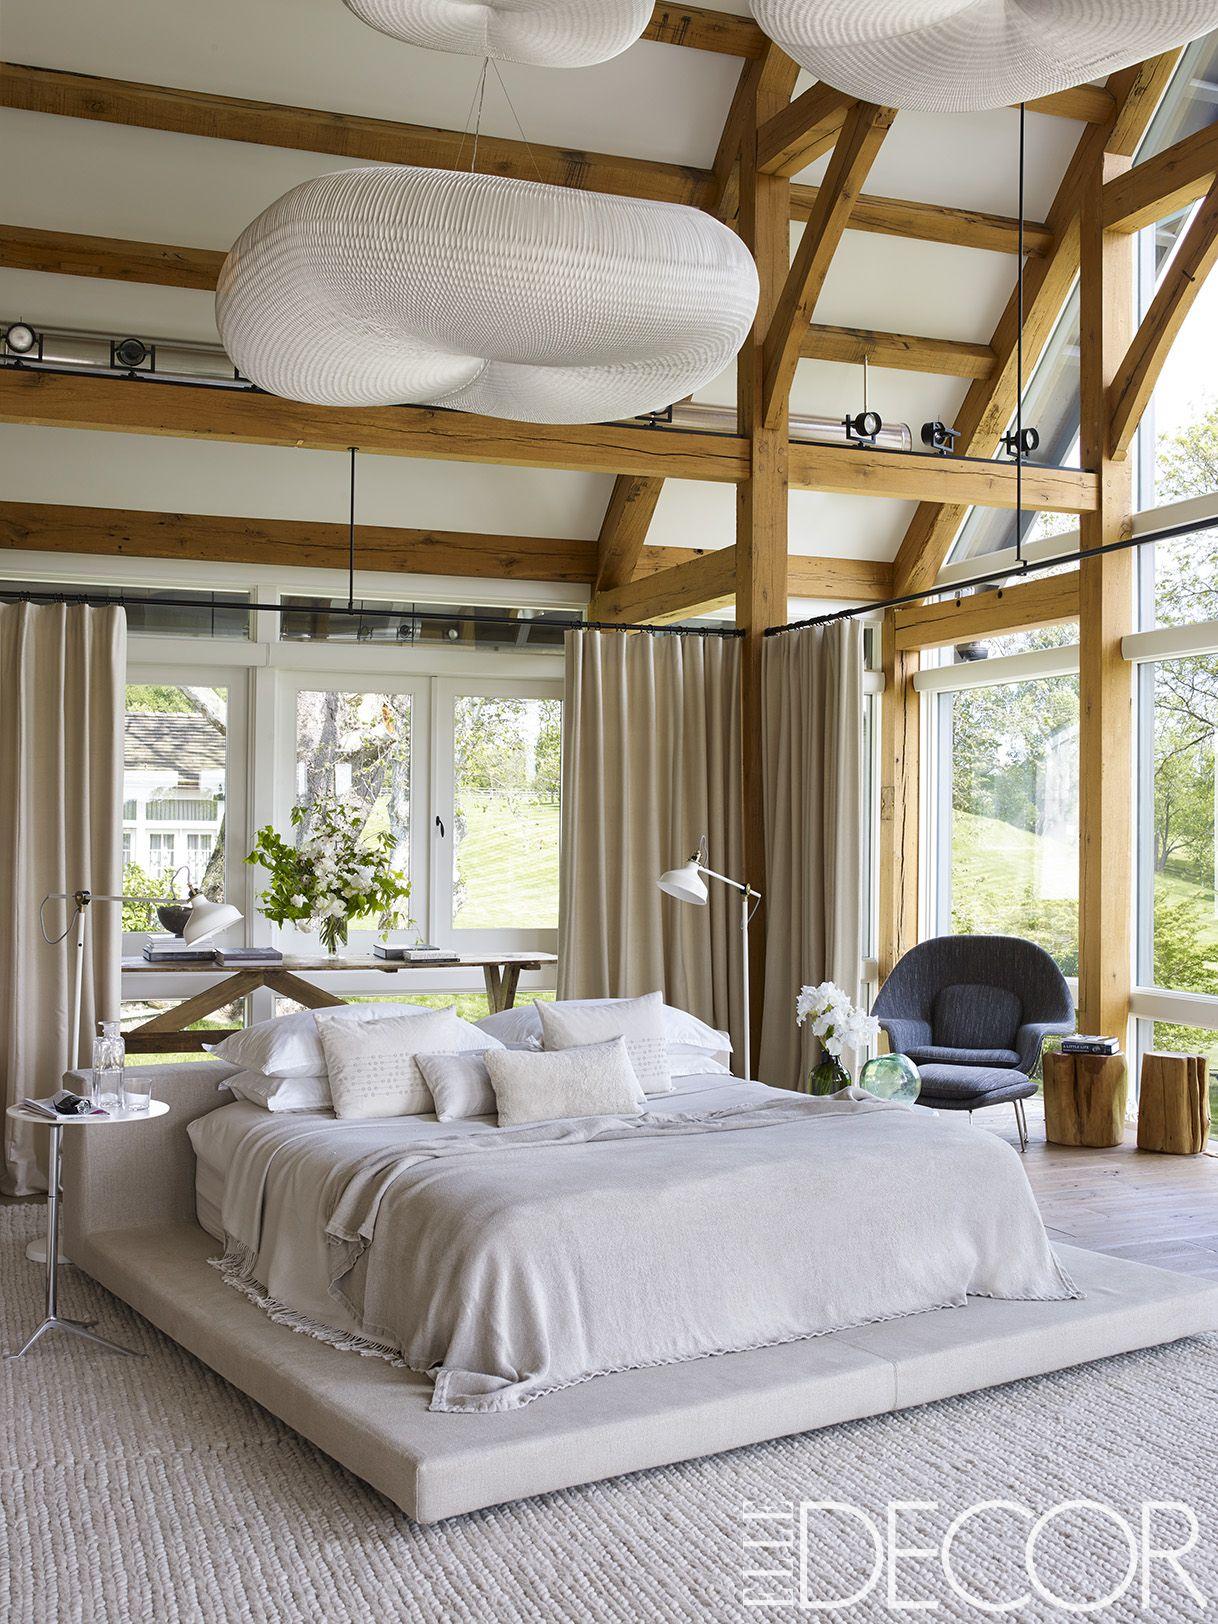 25 Minimalist Bedroom Decor Ideas Modern Designs For